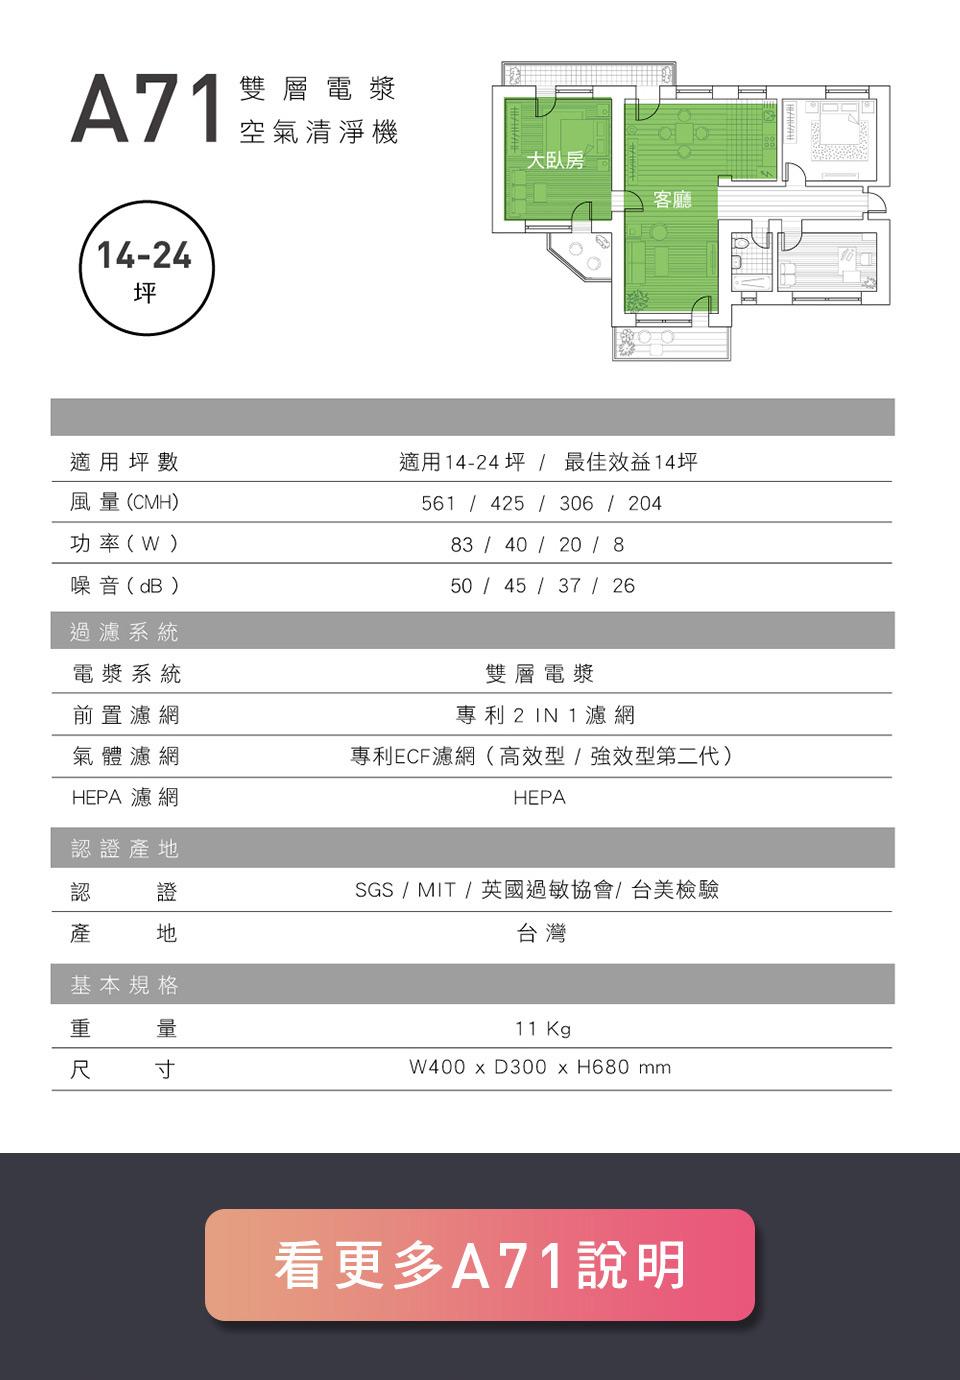 NEW週年慶LP_PC_20191112_v4_11_01